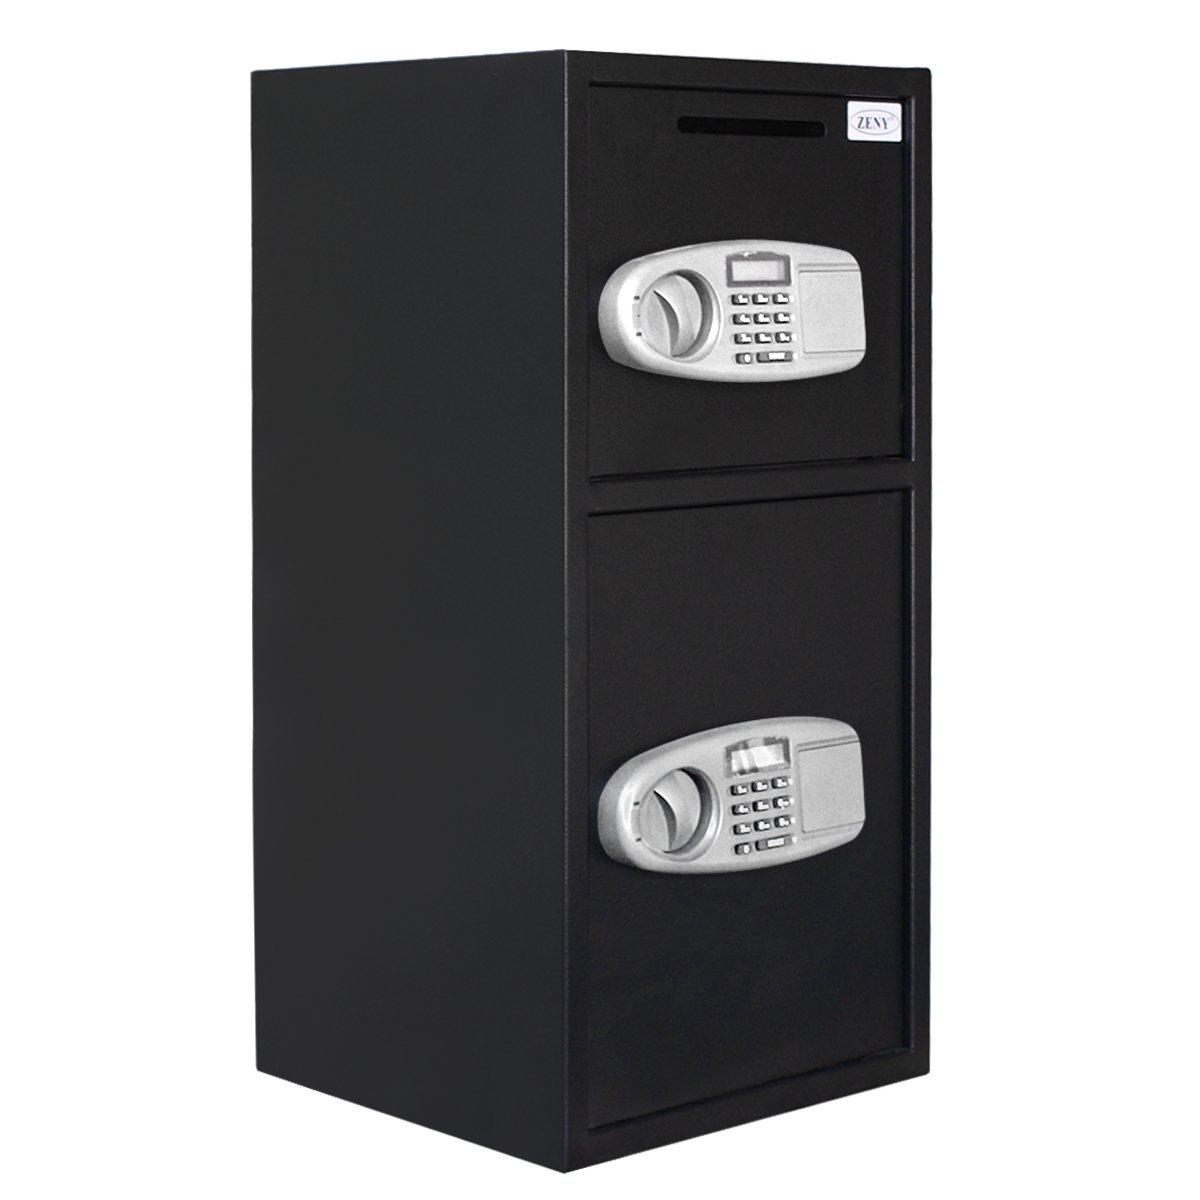 ZENY Large Digital Security Safe Box Double Door Depository for Money Gun Jewelry